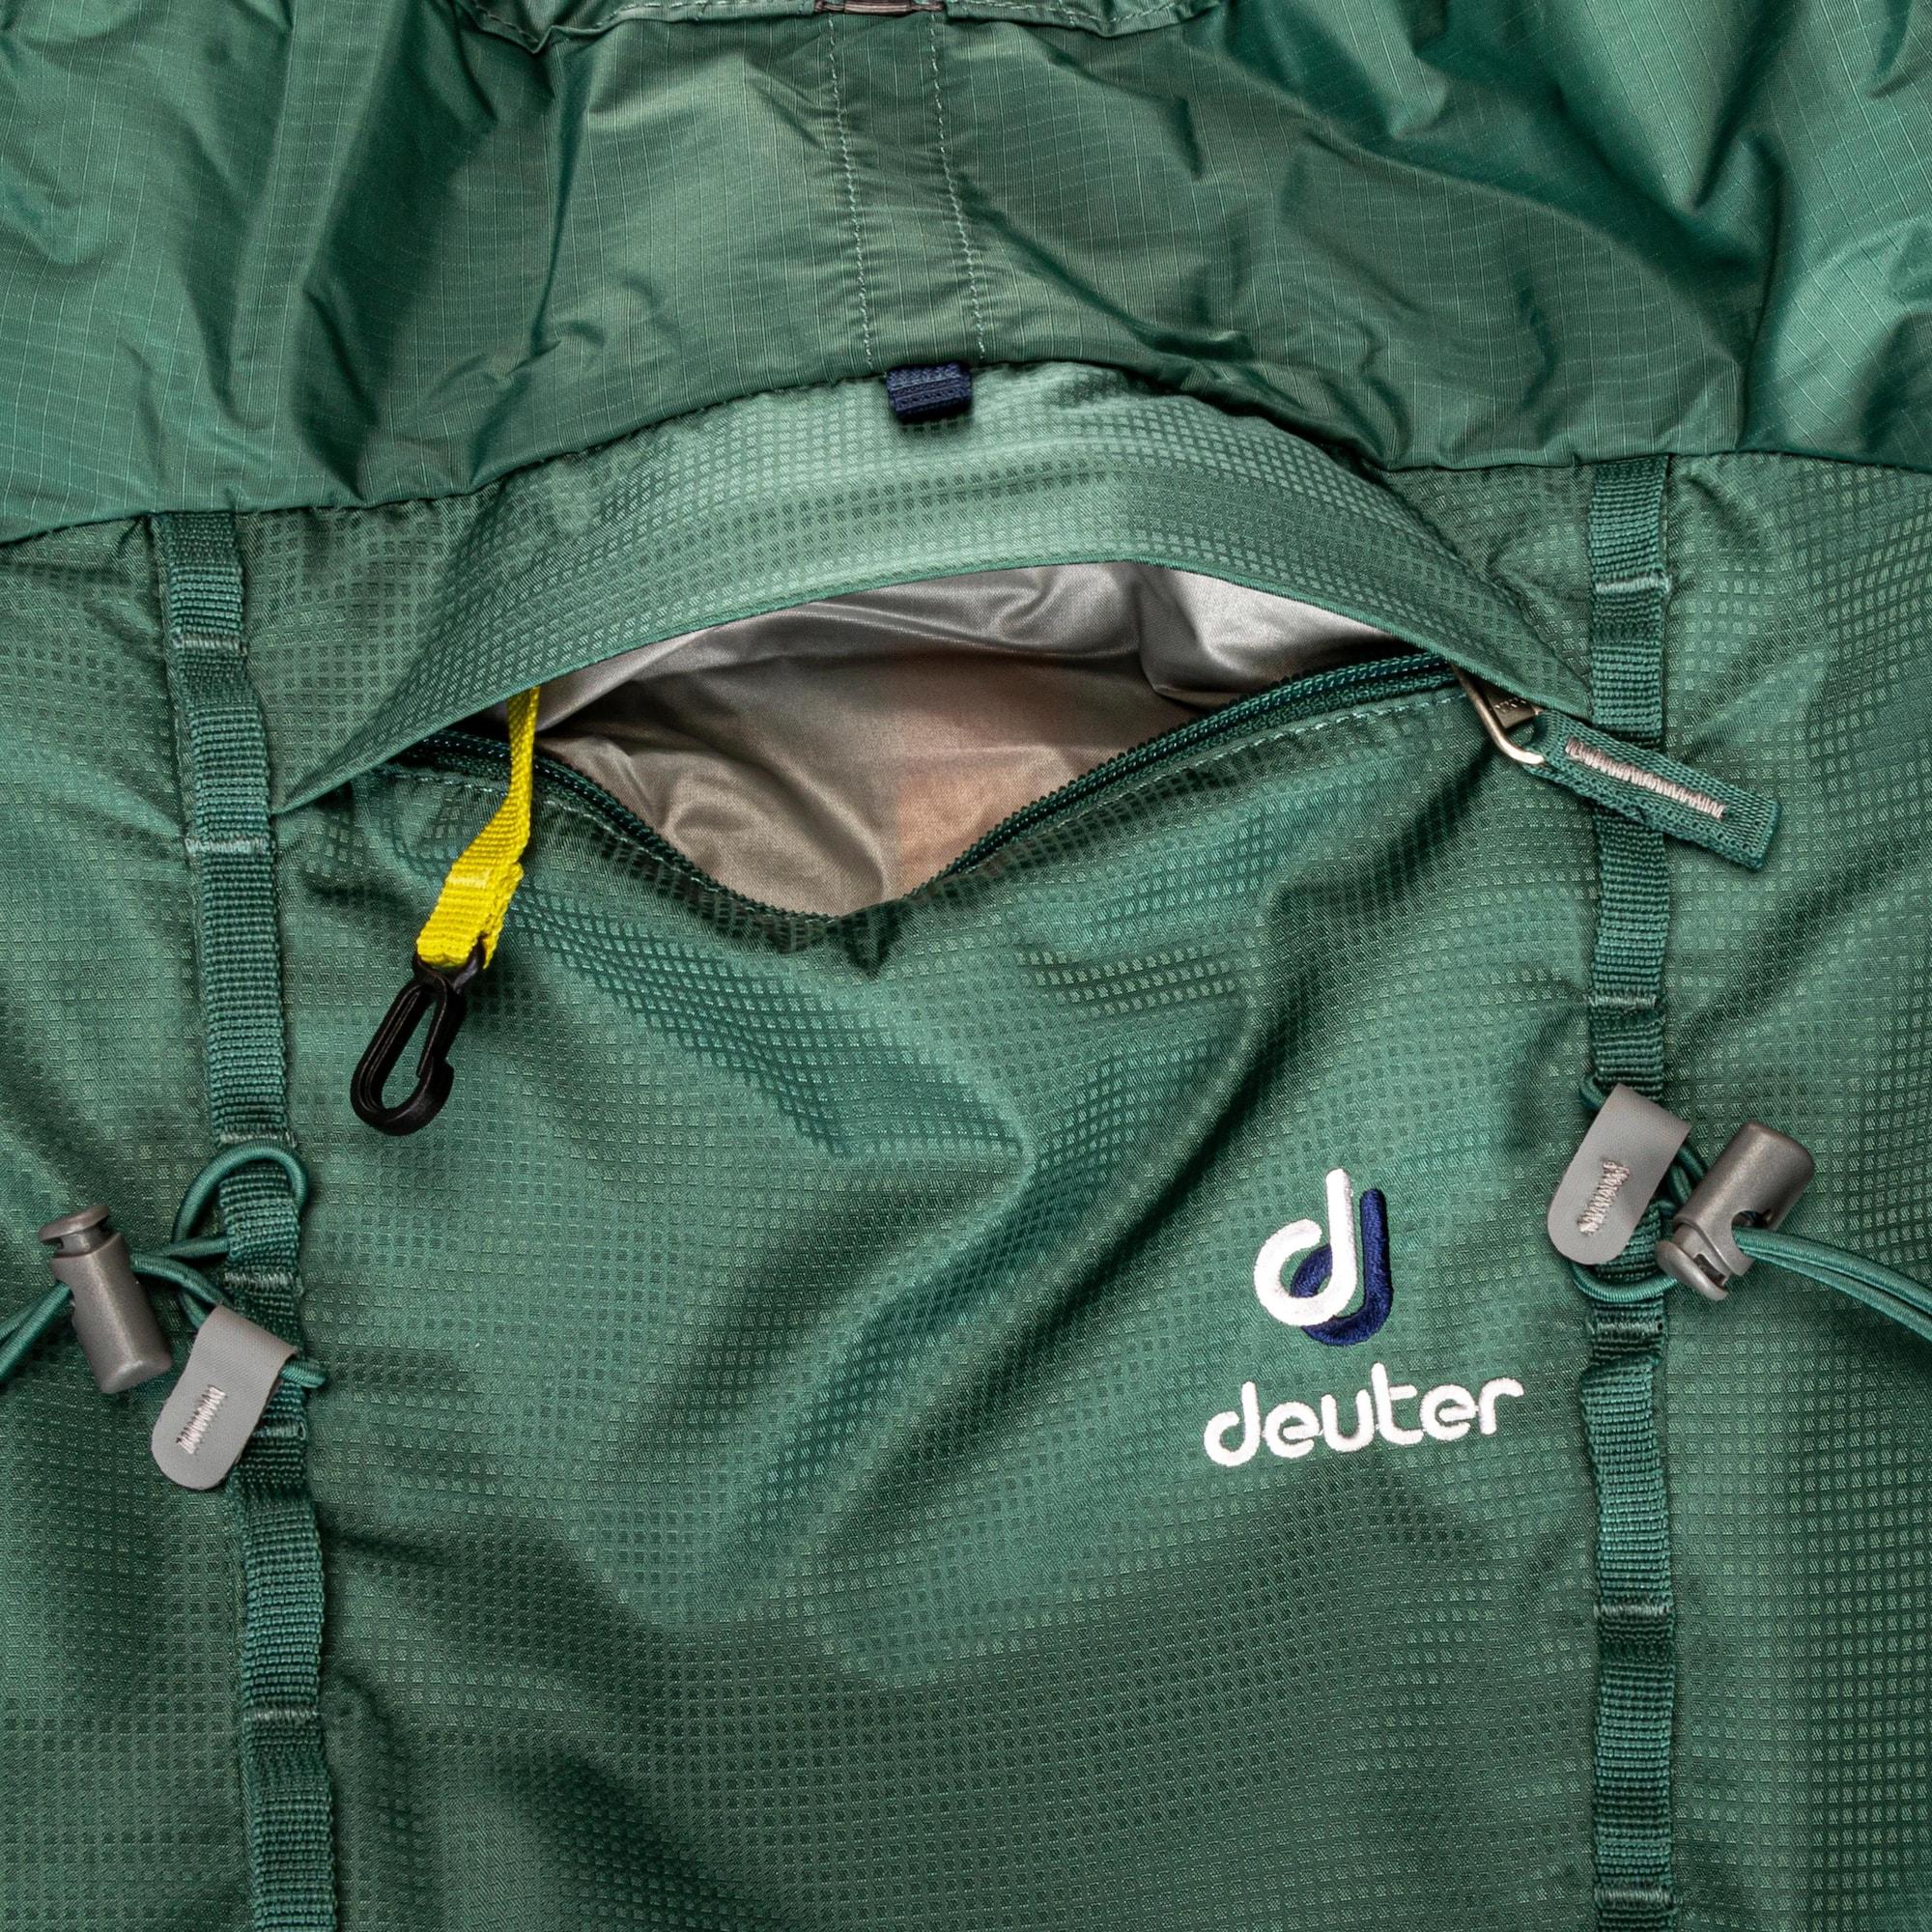 deuter - Rucksack 'Guide Lite 24'